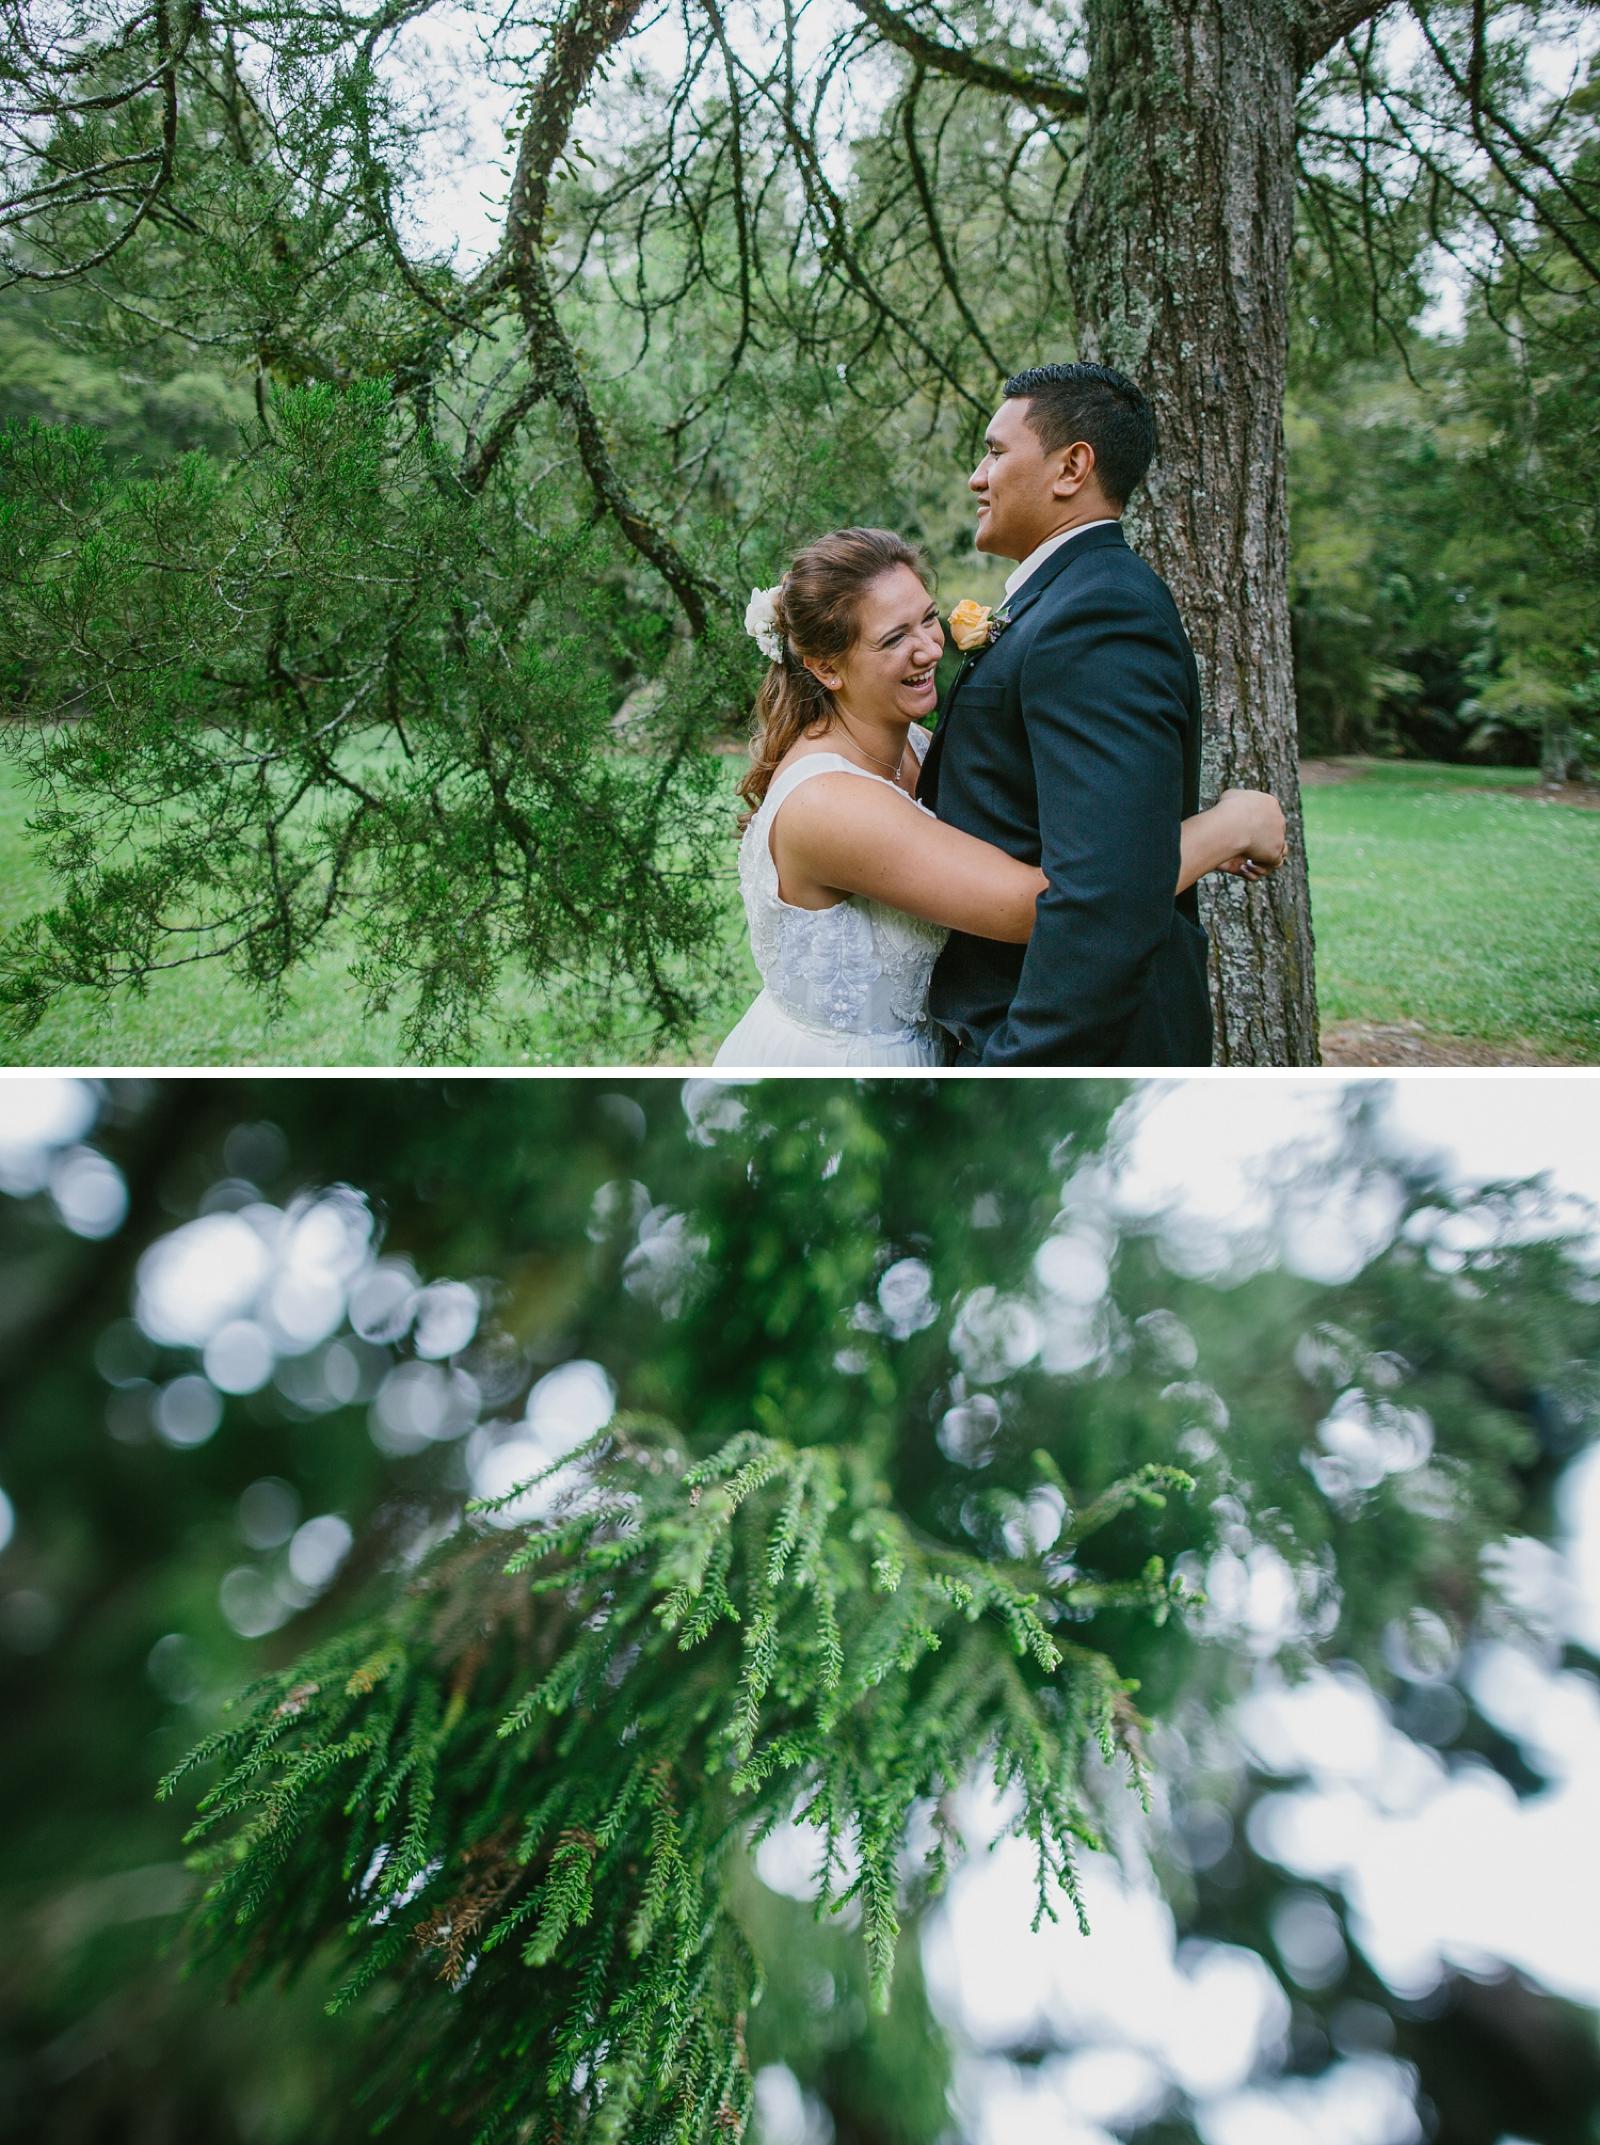 GabbyFiti_Auckland Wedding Photographer_Patty Lagera_0087.jpg